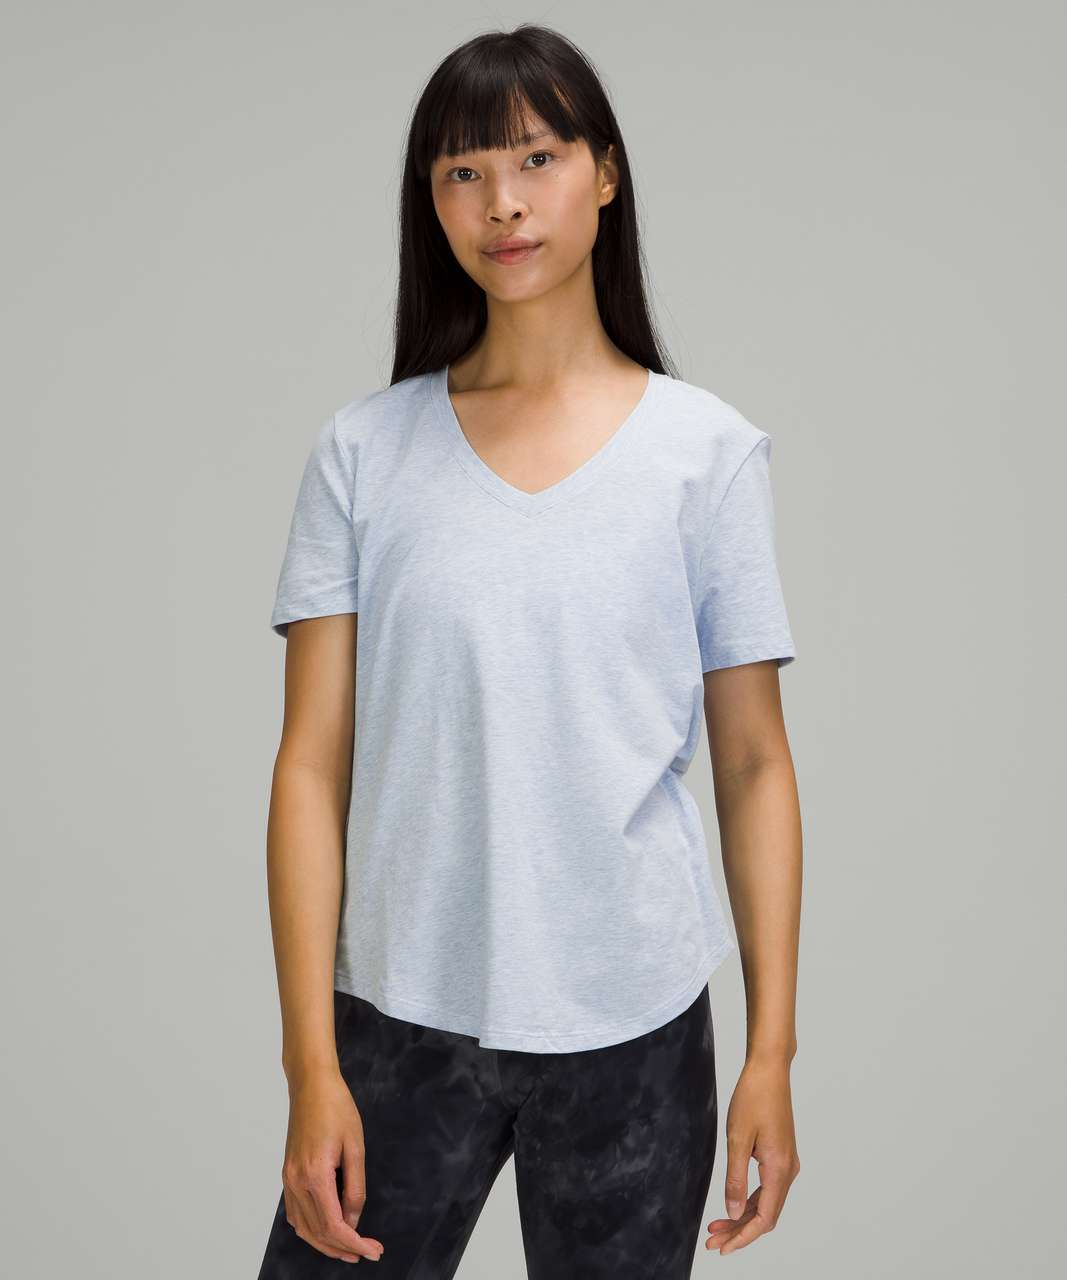 Lululemon Love Tee Short Sleeve V-Neck T-Shirt - Heathered Blue Linen